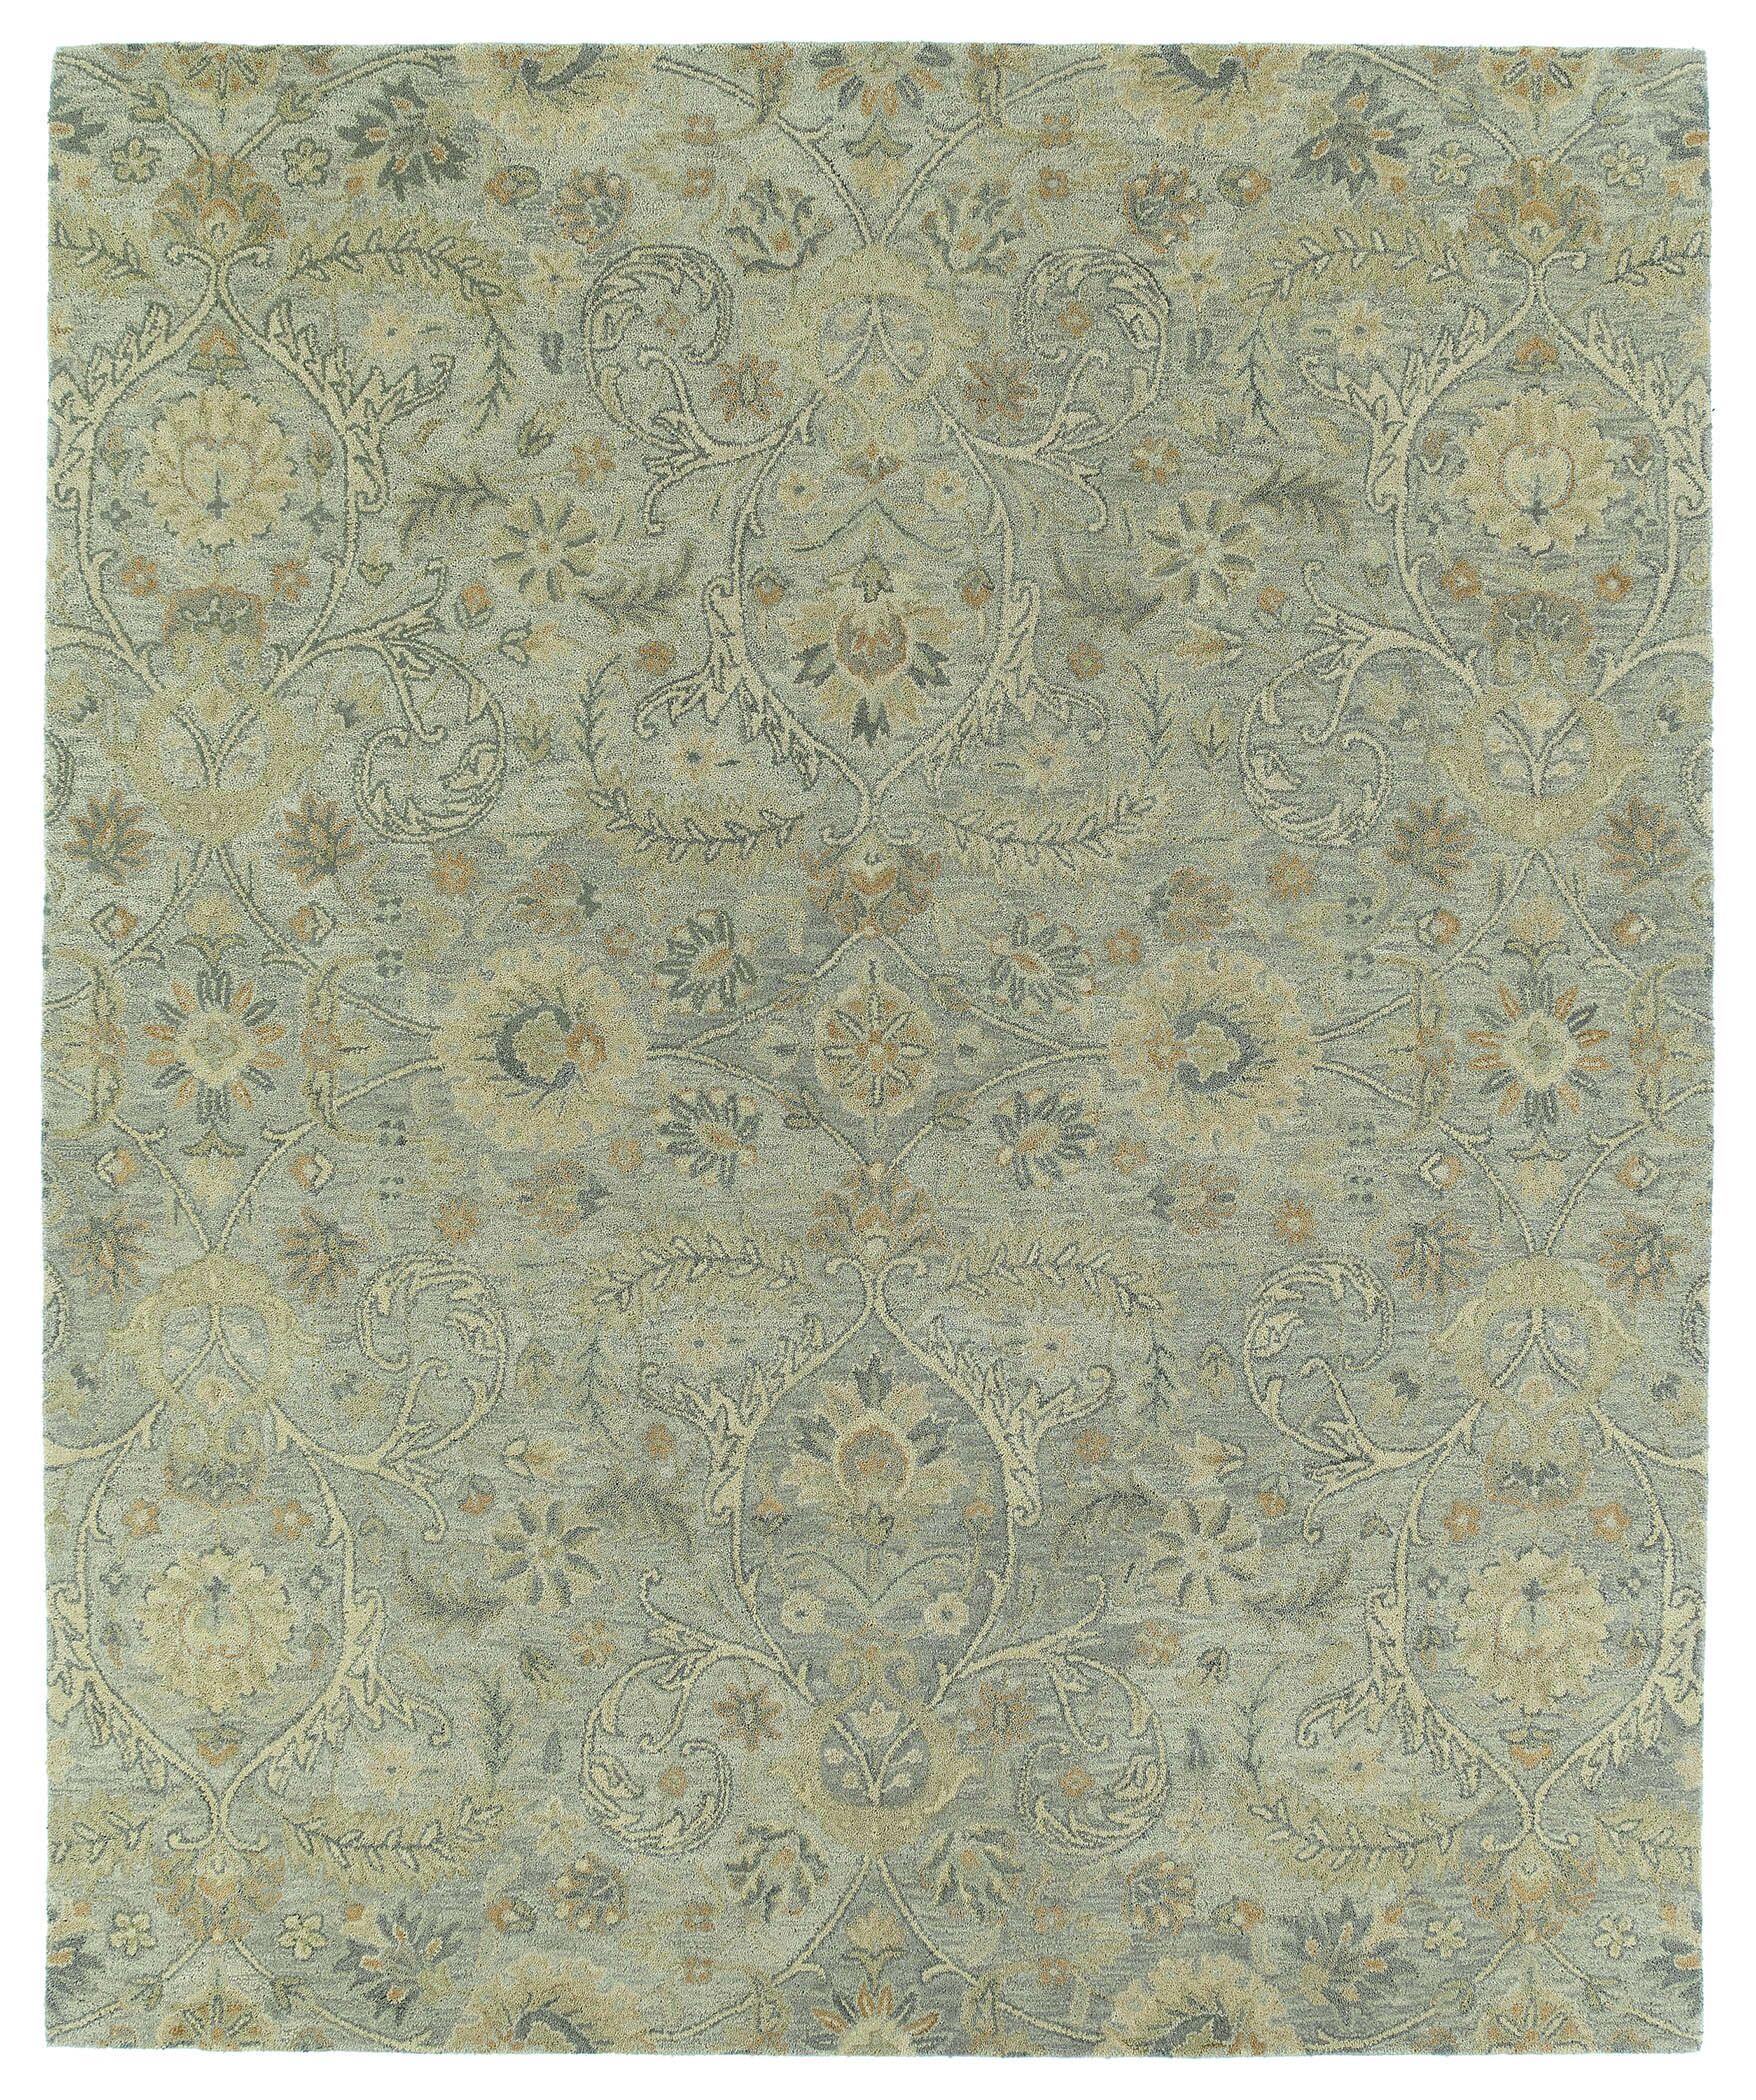 Casper Gray Athena Rug Rug Size: Rectangle 8' x 10'